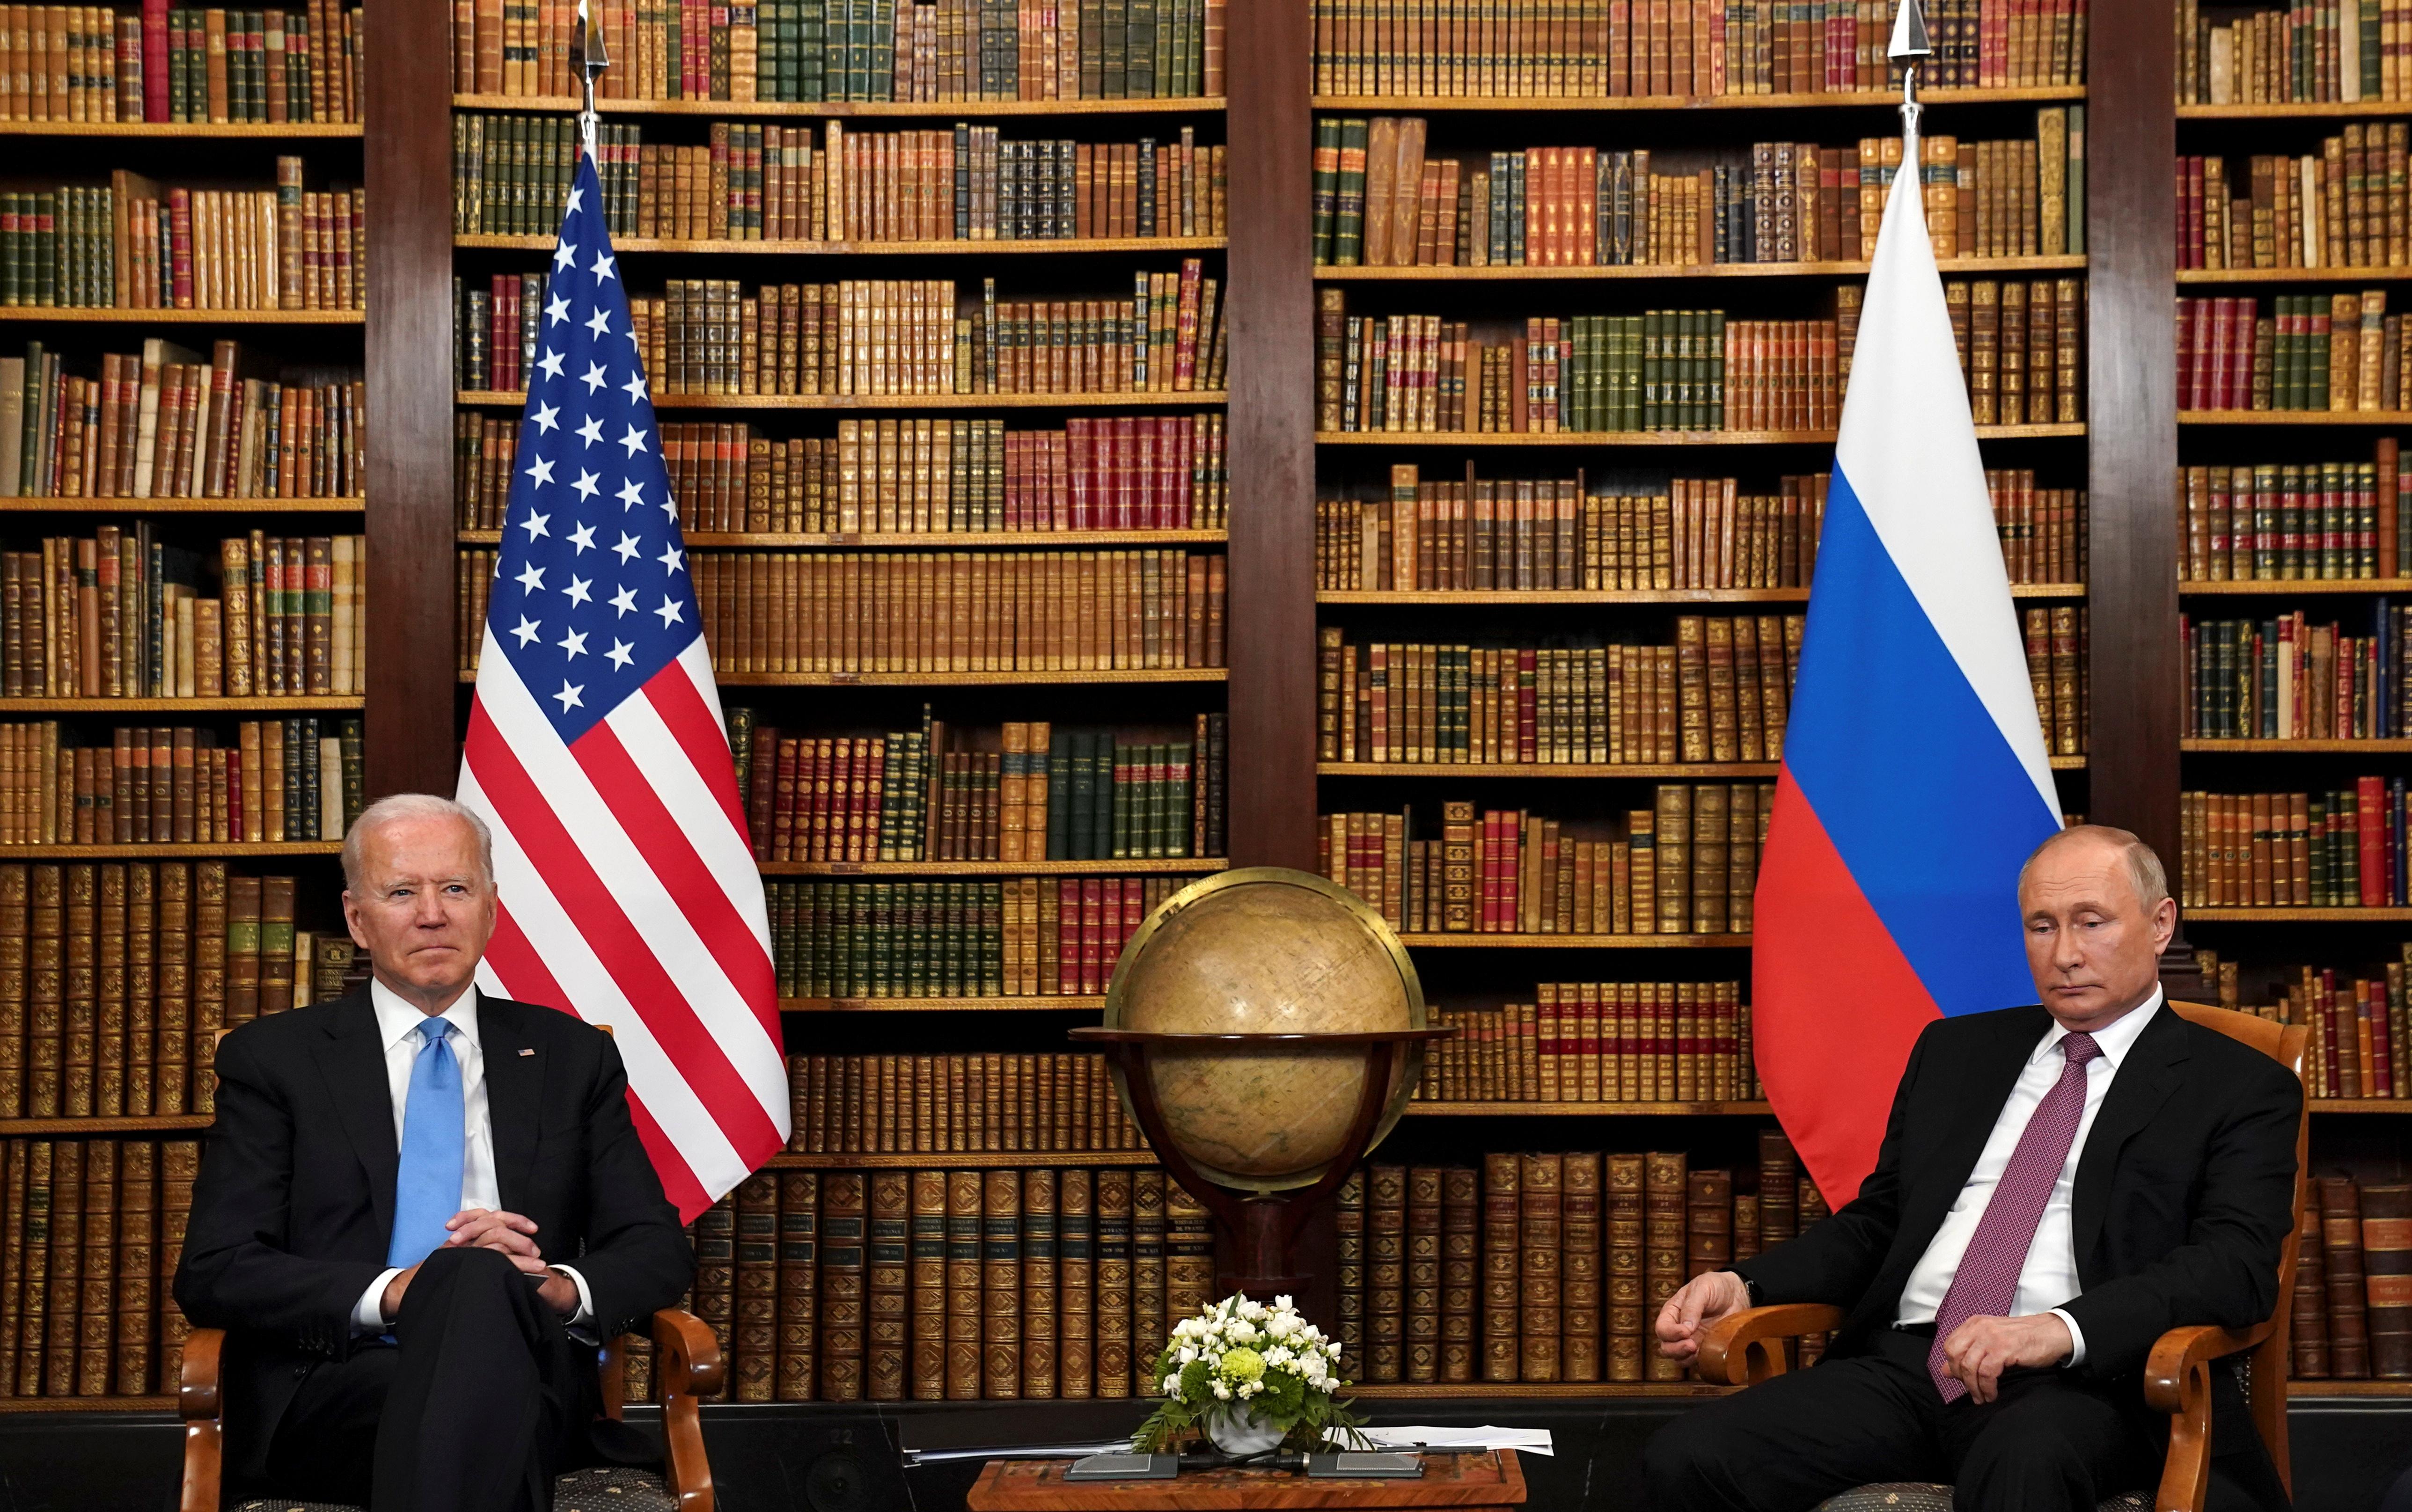 U.S. President Joe Biden and Russia's President Vladimir Putin meet for the U.S.-Russia summit at Villa La Grange in Geneva, Switzerland, June 16, 2021. REUTERS/Kevin Lamarque